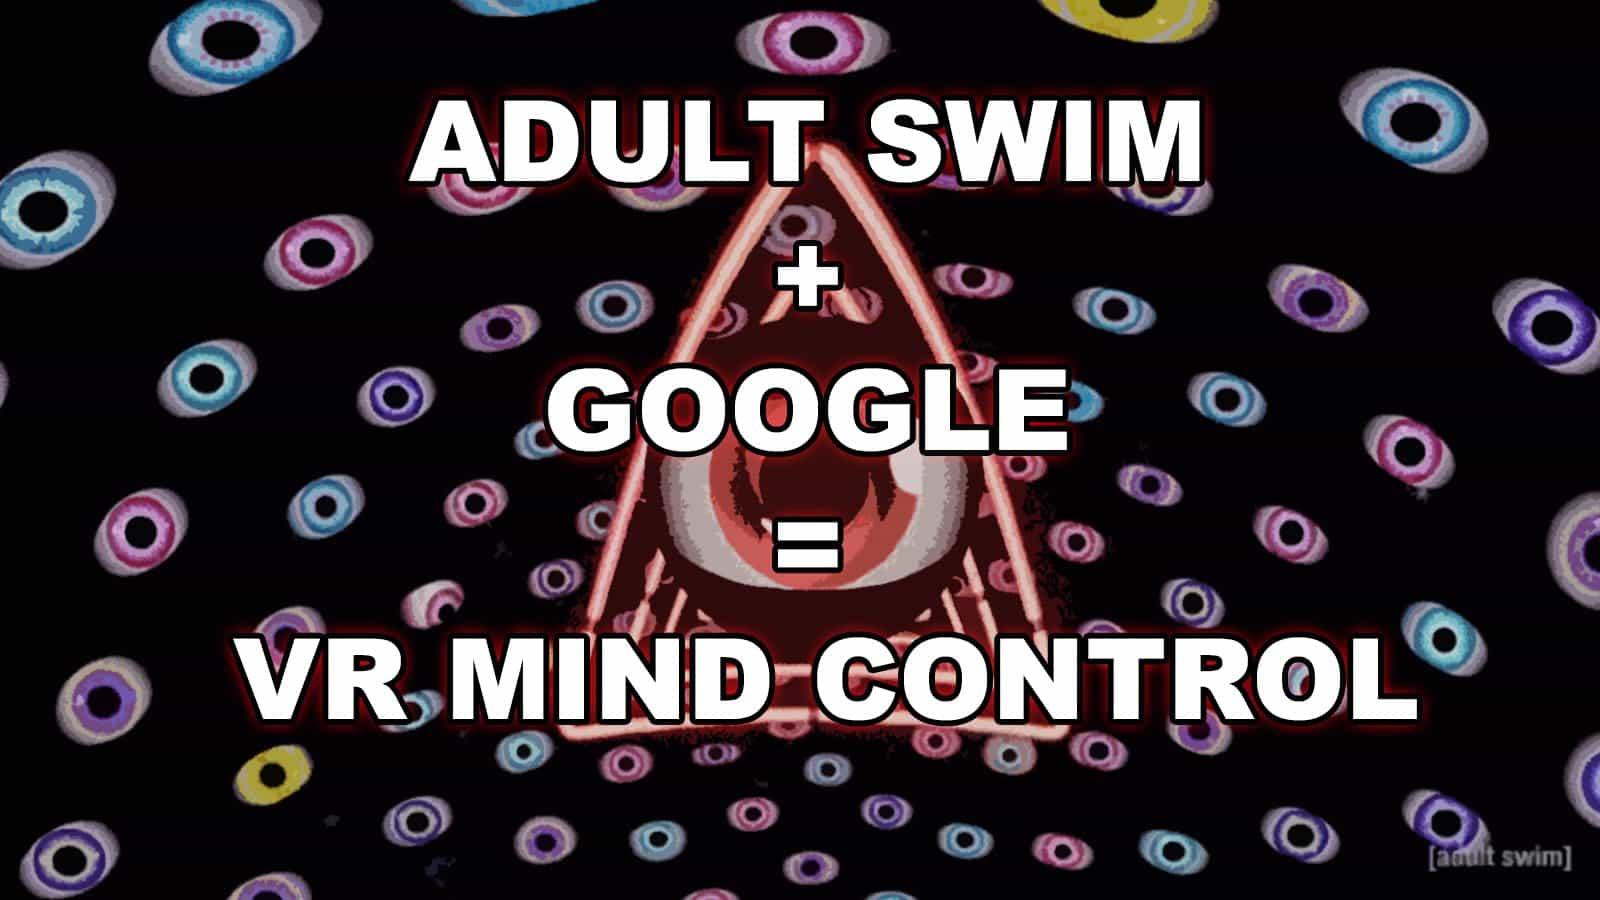 ADULT SWIM + GOOGLE = VR MIND CONTROL